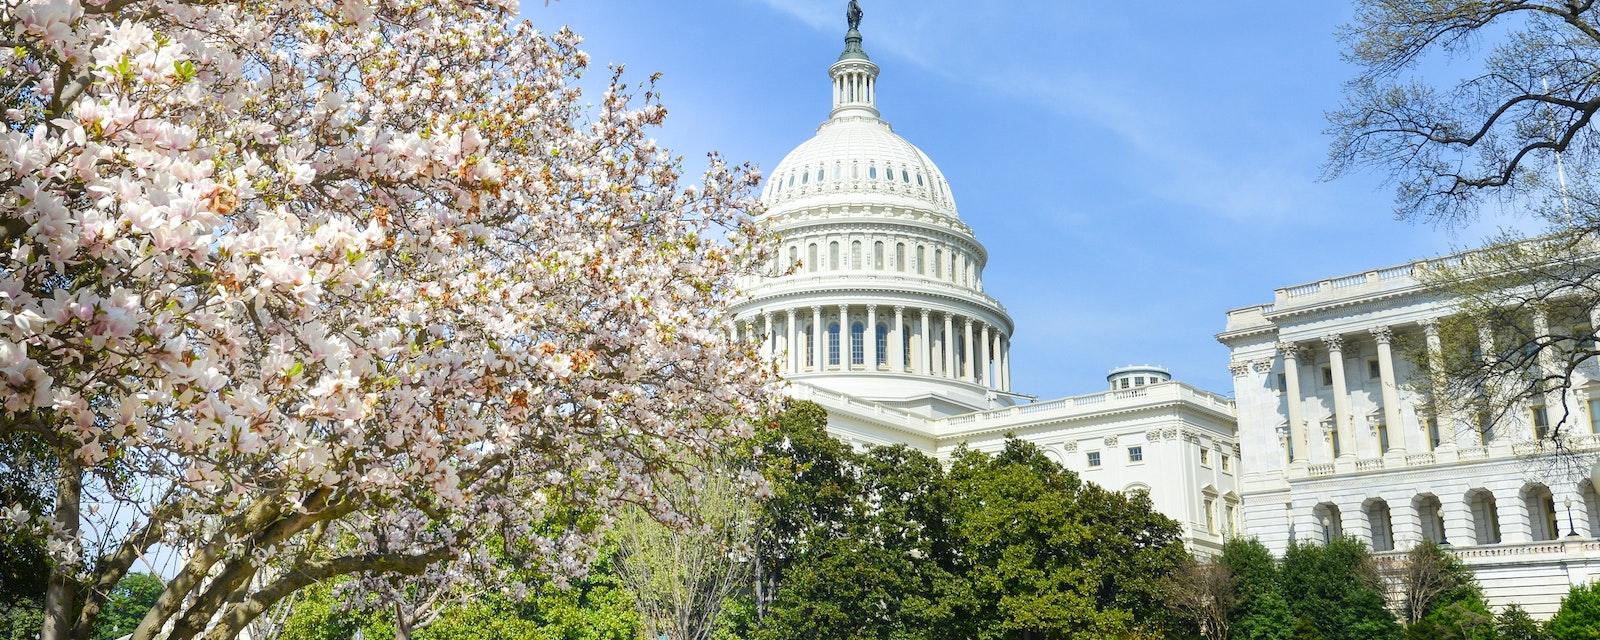 The,Capitol,In,Spring,Season,-,Washington,Dc,,United,States